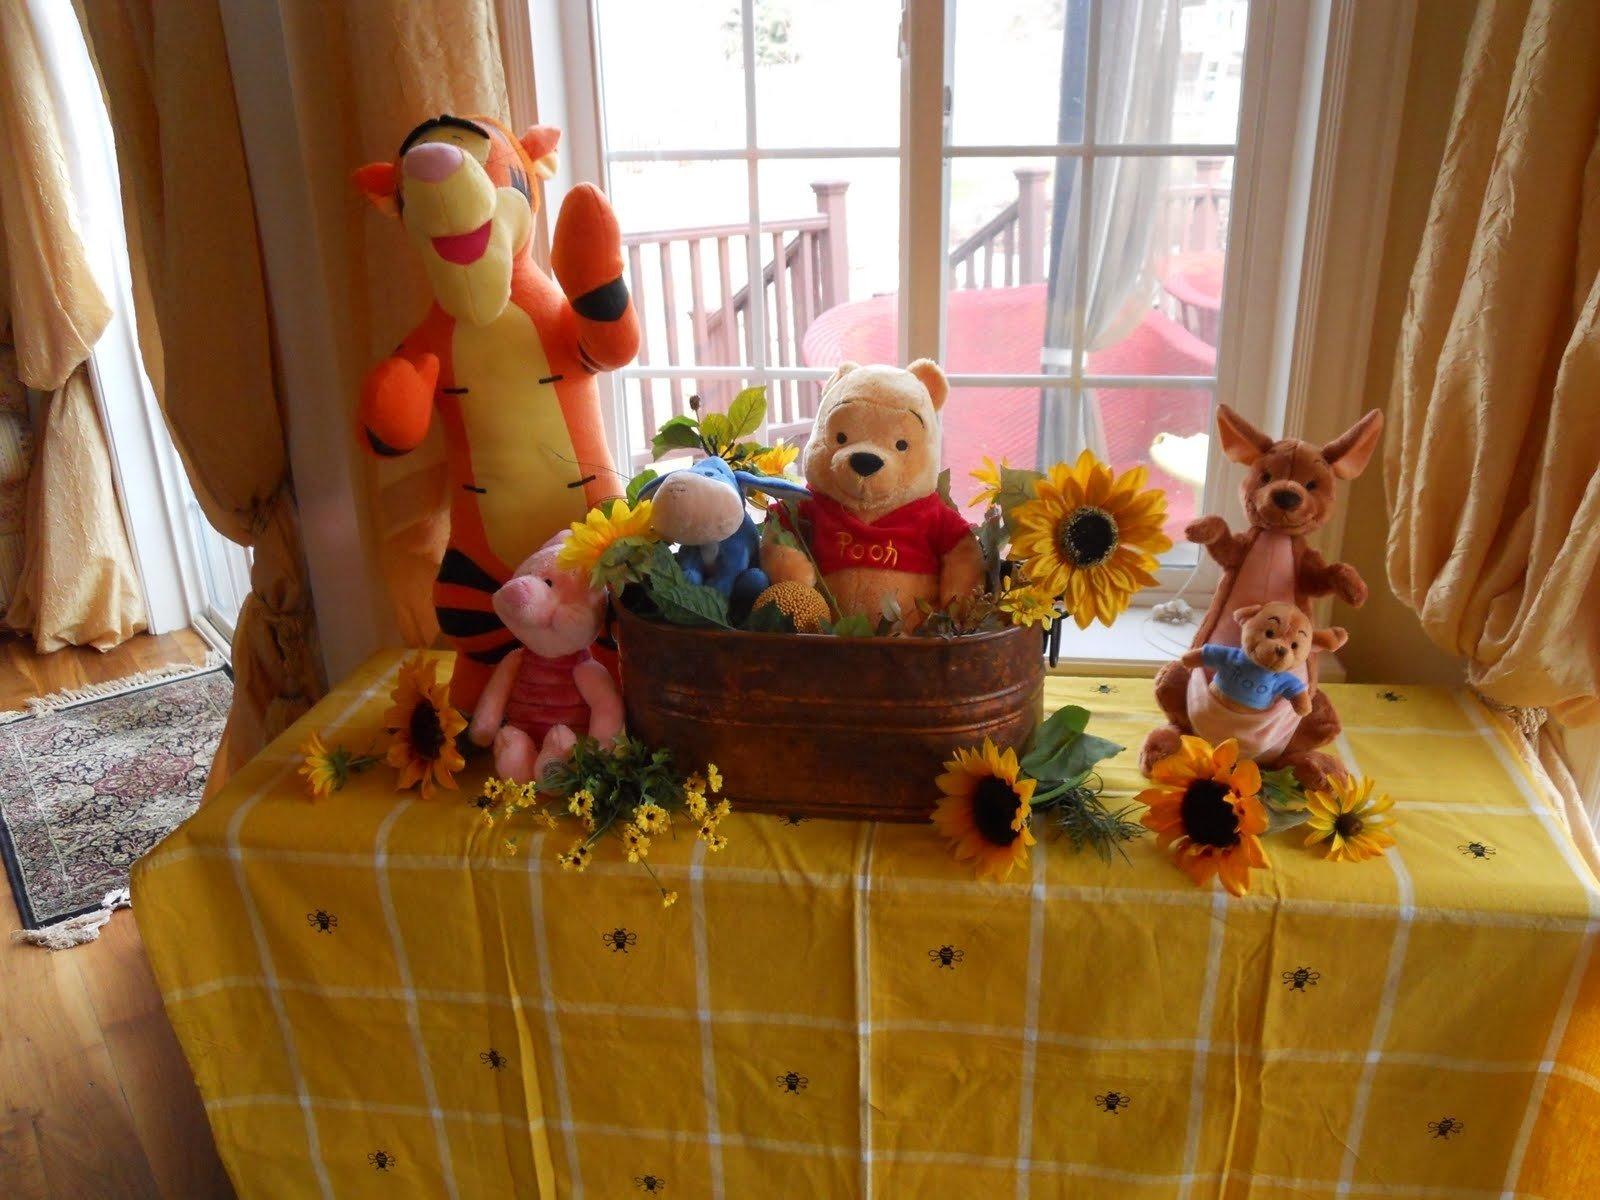 10 Stylish Winnie The Pooh Birthday Ideas winnie the pooh baby shower decor baby shower ideas gallery 2021